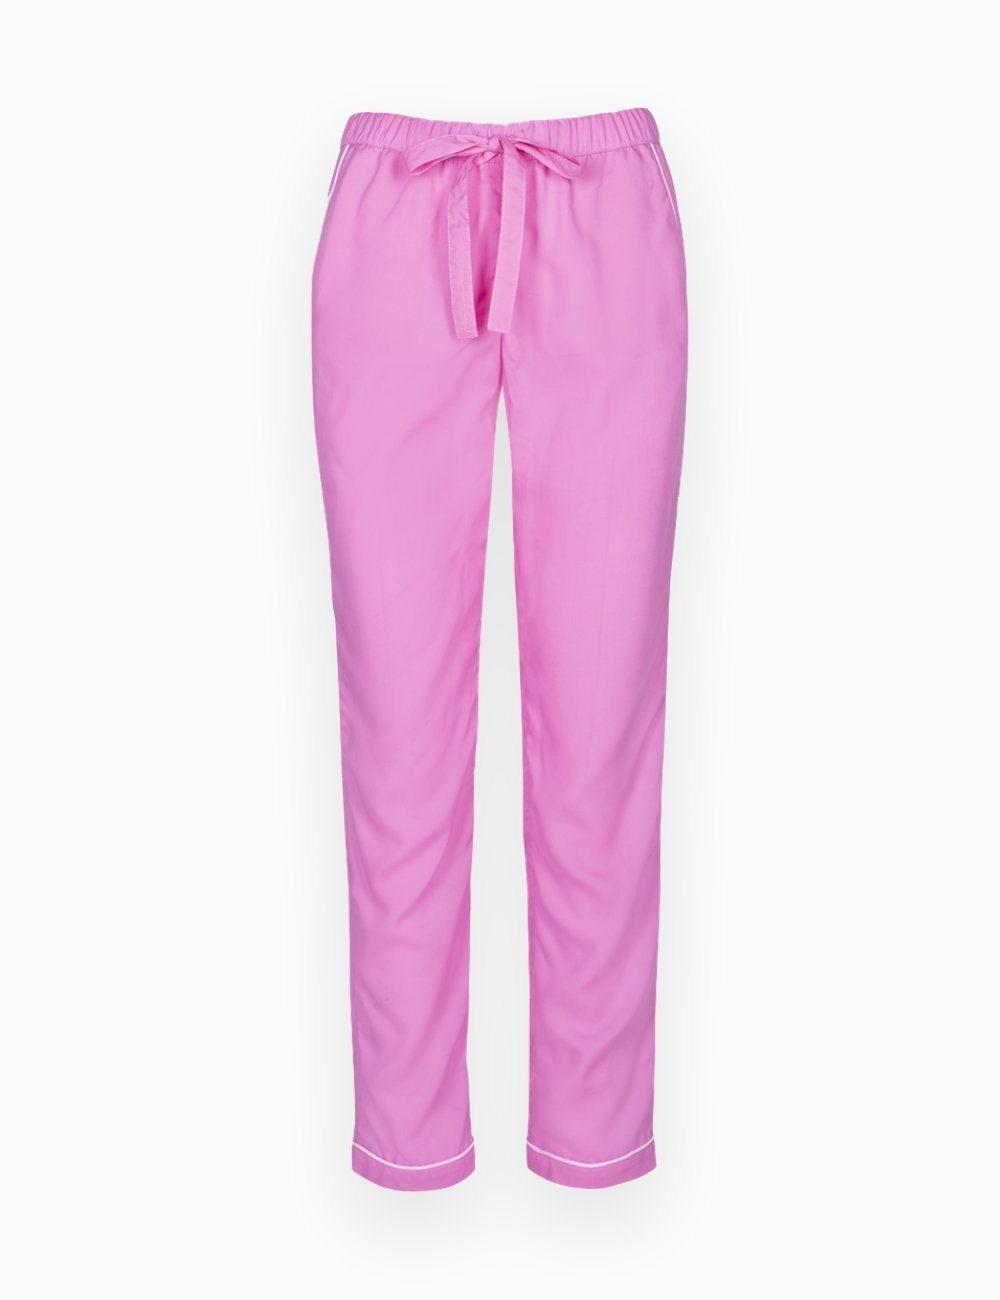 Pyjama Bottoms Bombshell